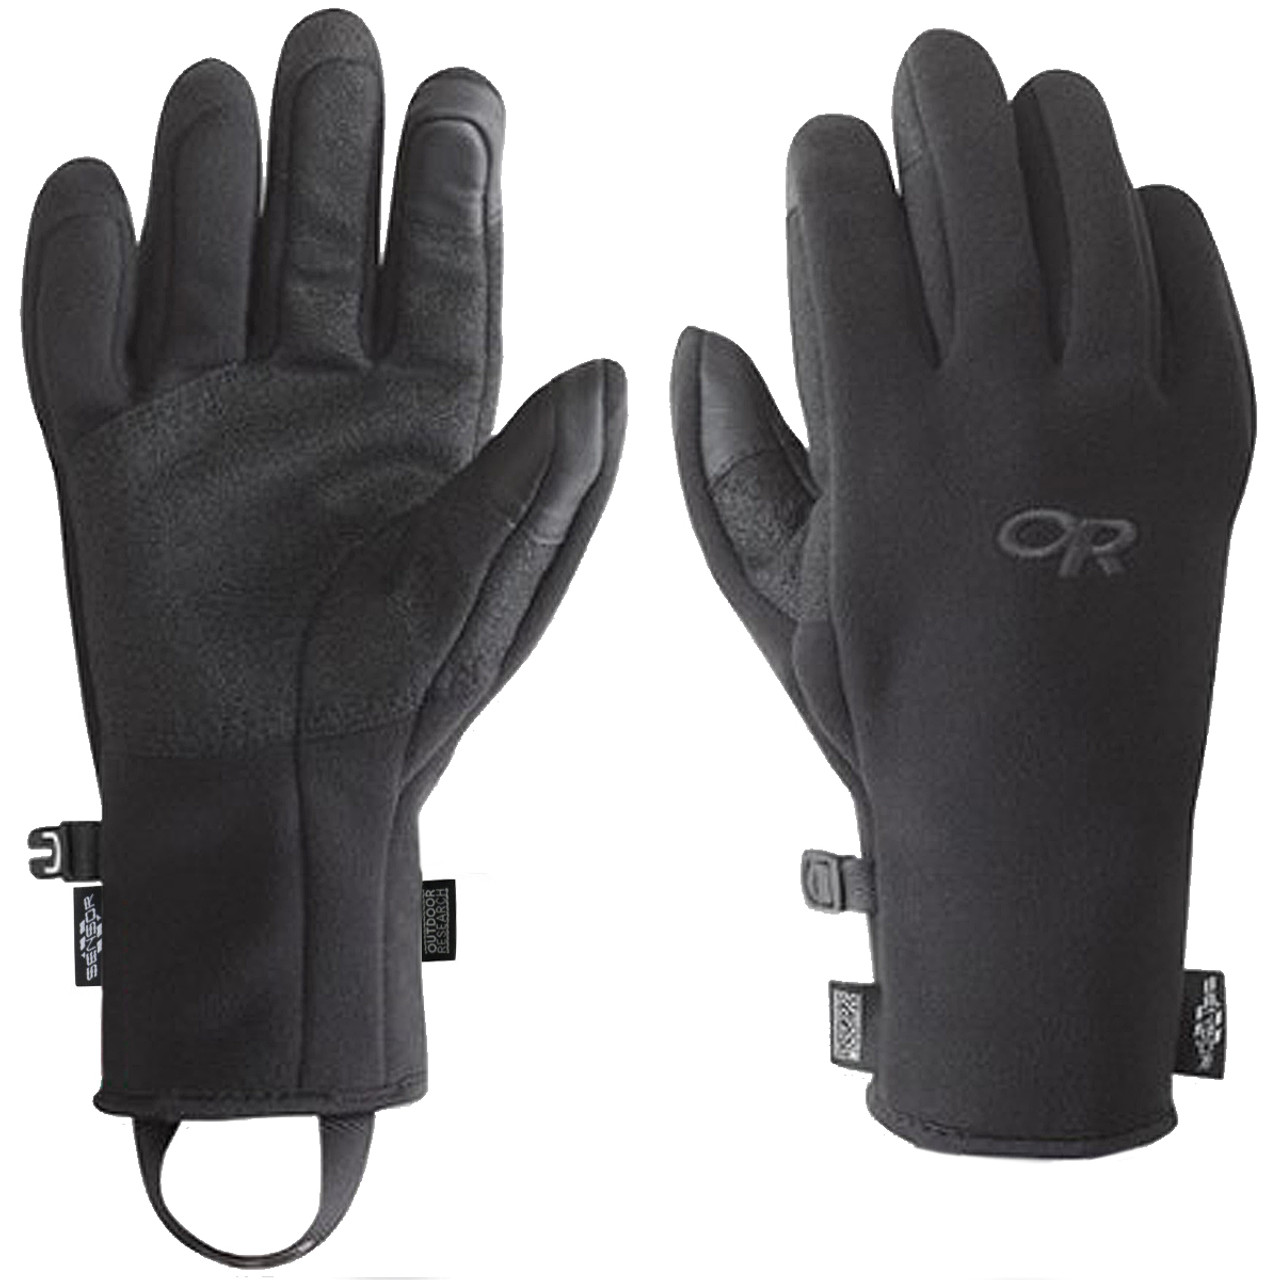 Outdoor Research Gripper Sensor Mens Gloves Black All Sizes